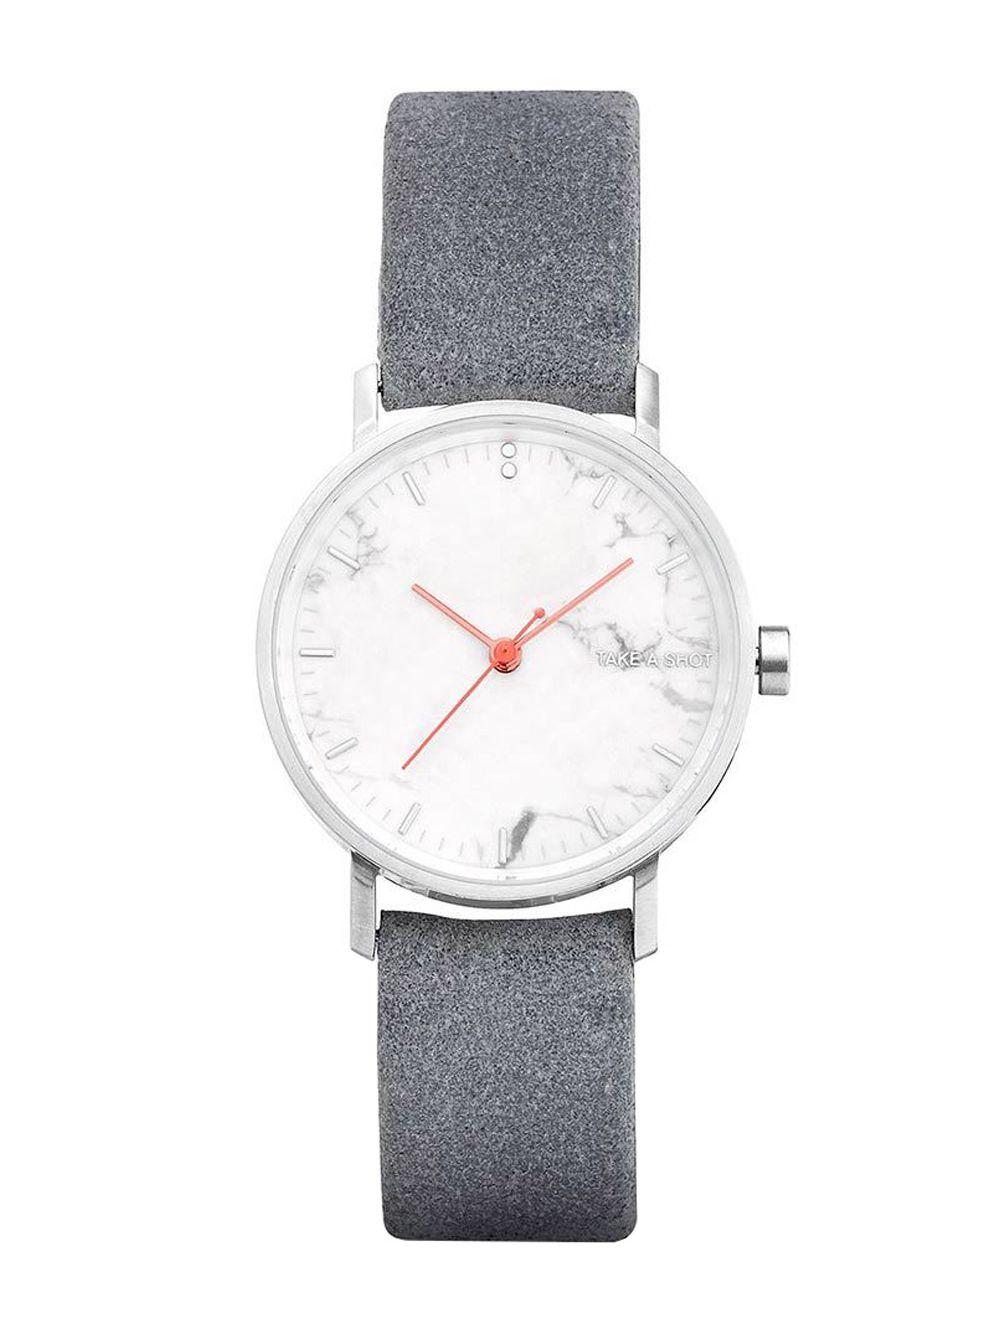 1cad9e3a01 TAKE A SHOT Damen-Armbanduhr mit Marmor-Zifferblatt Ivy